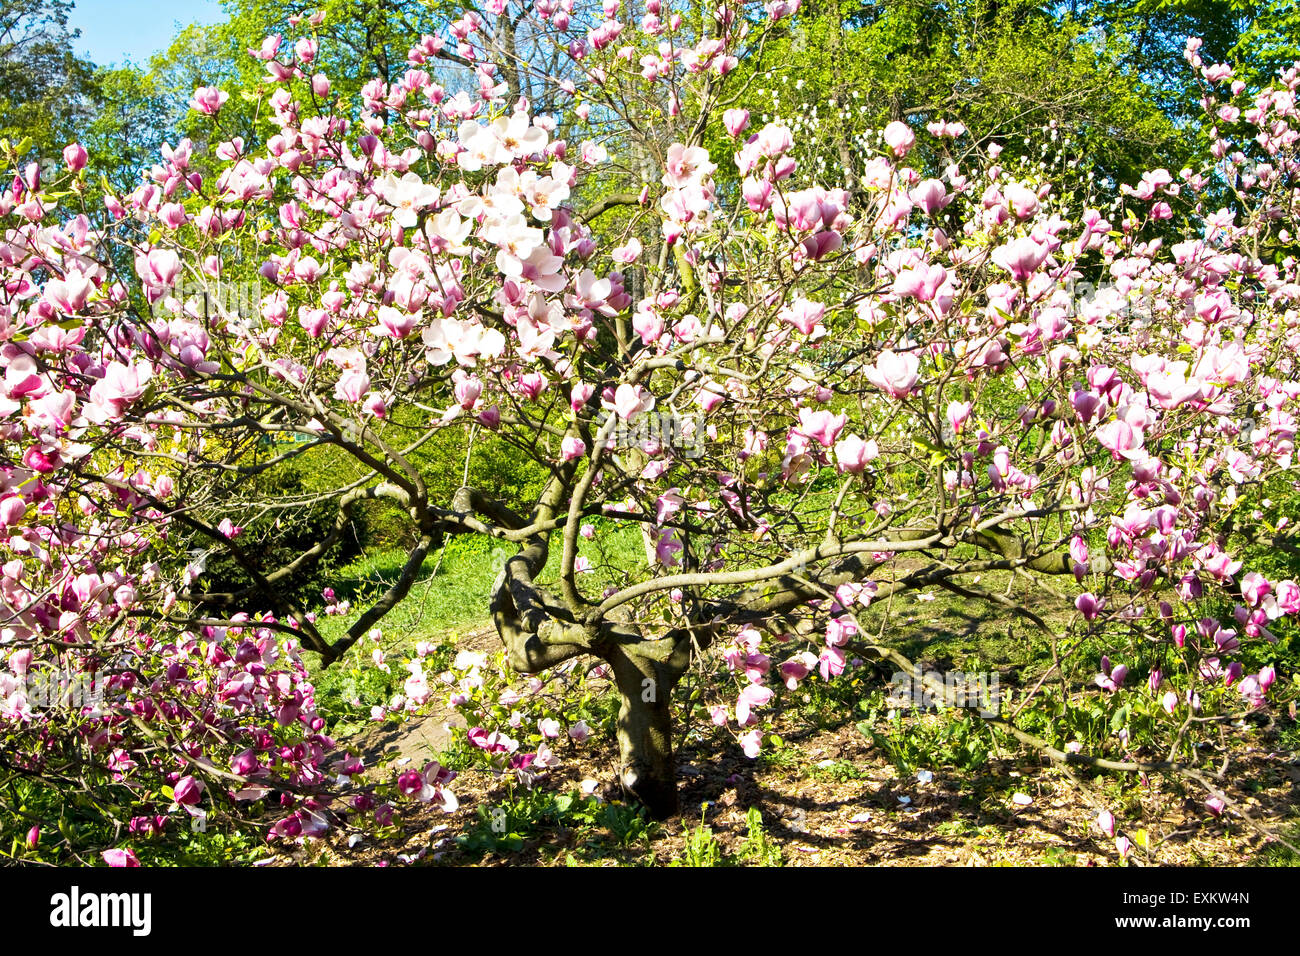 Southern Magnolia Tree Stock Photos & Southern Magnolia Tree Stock ...